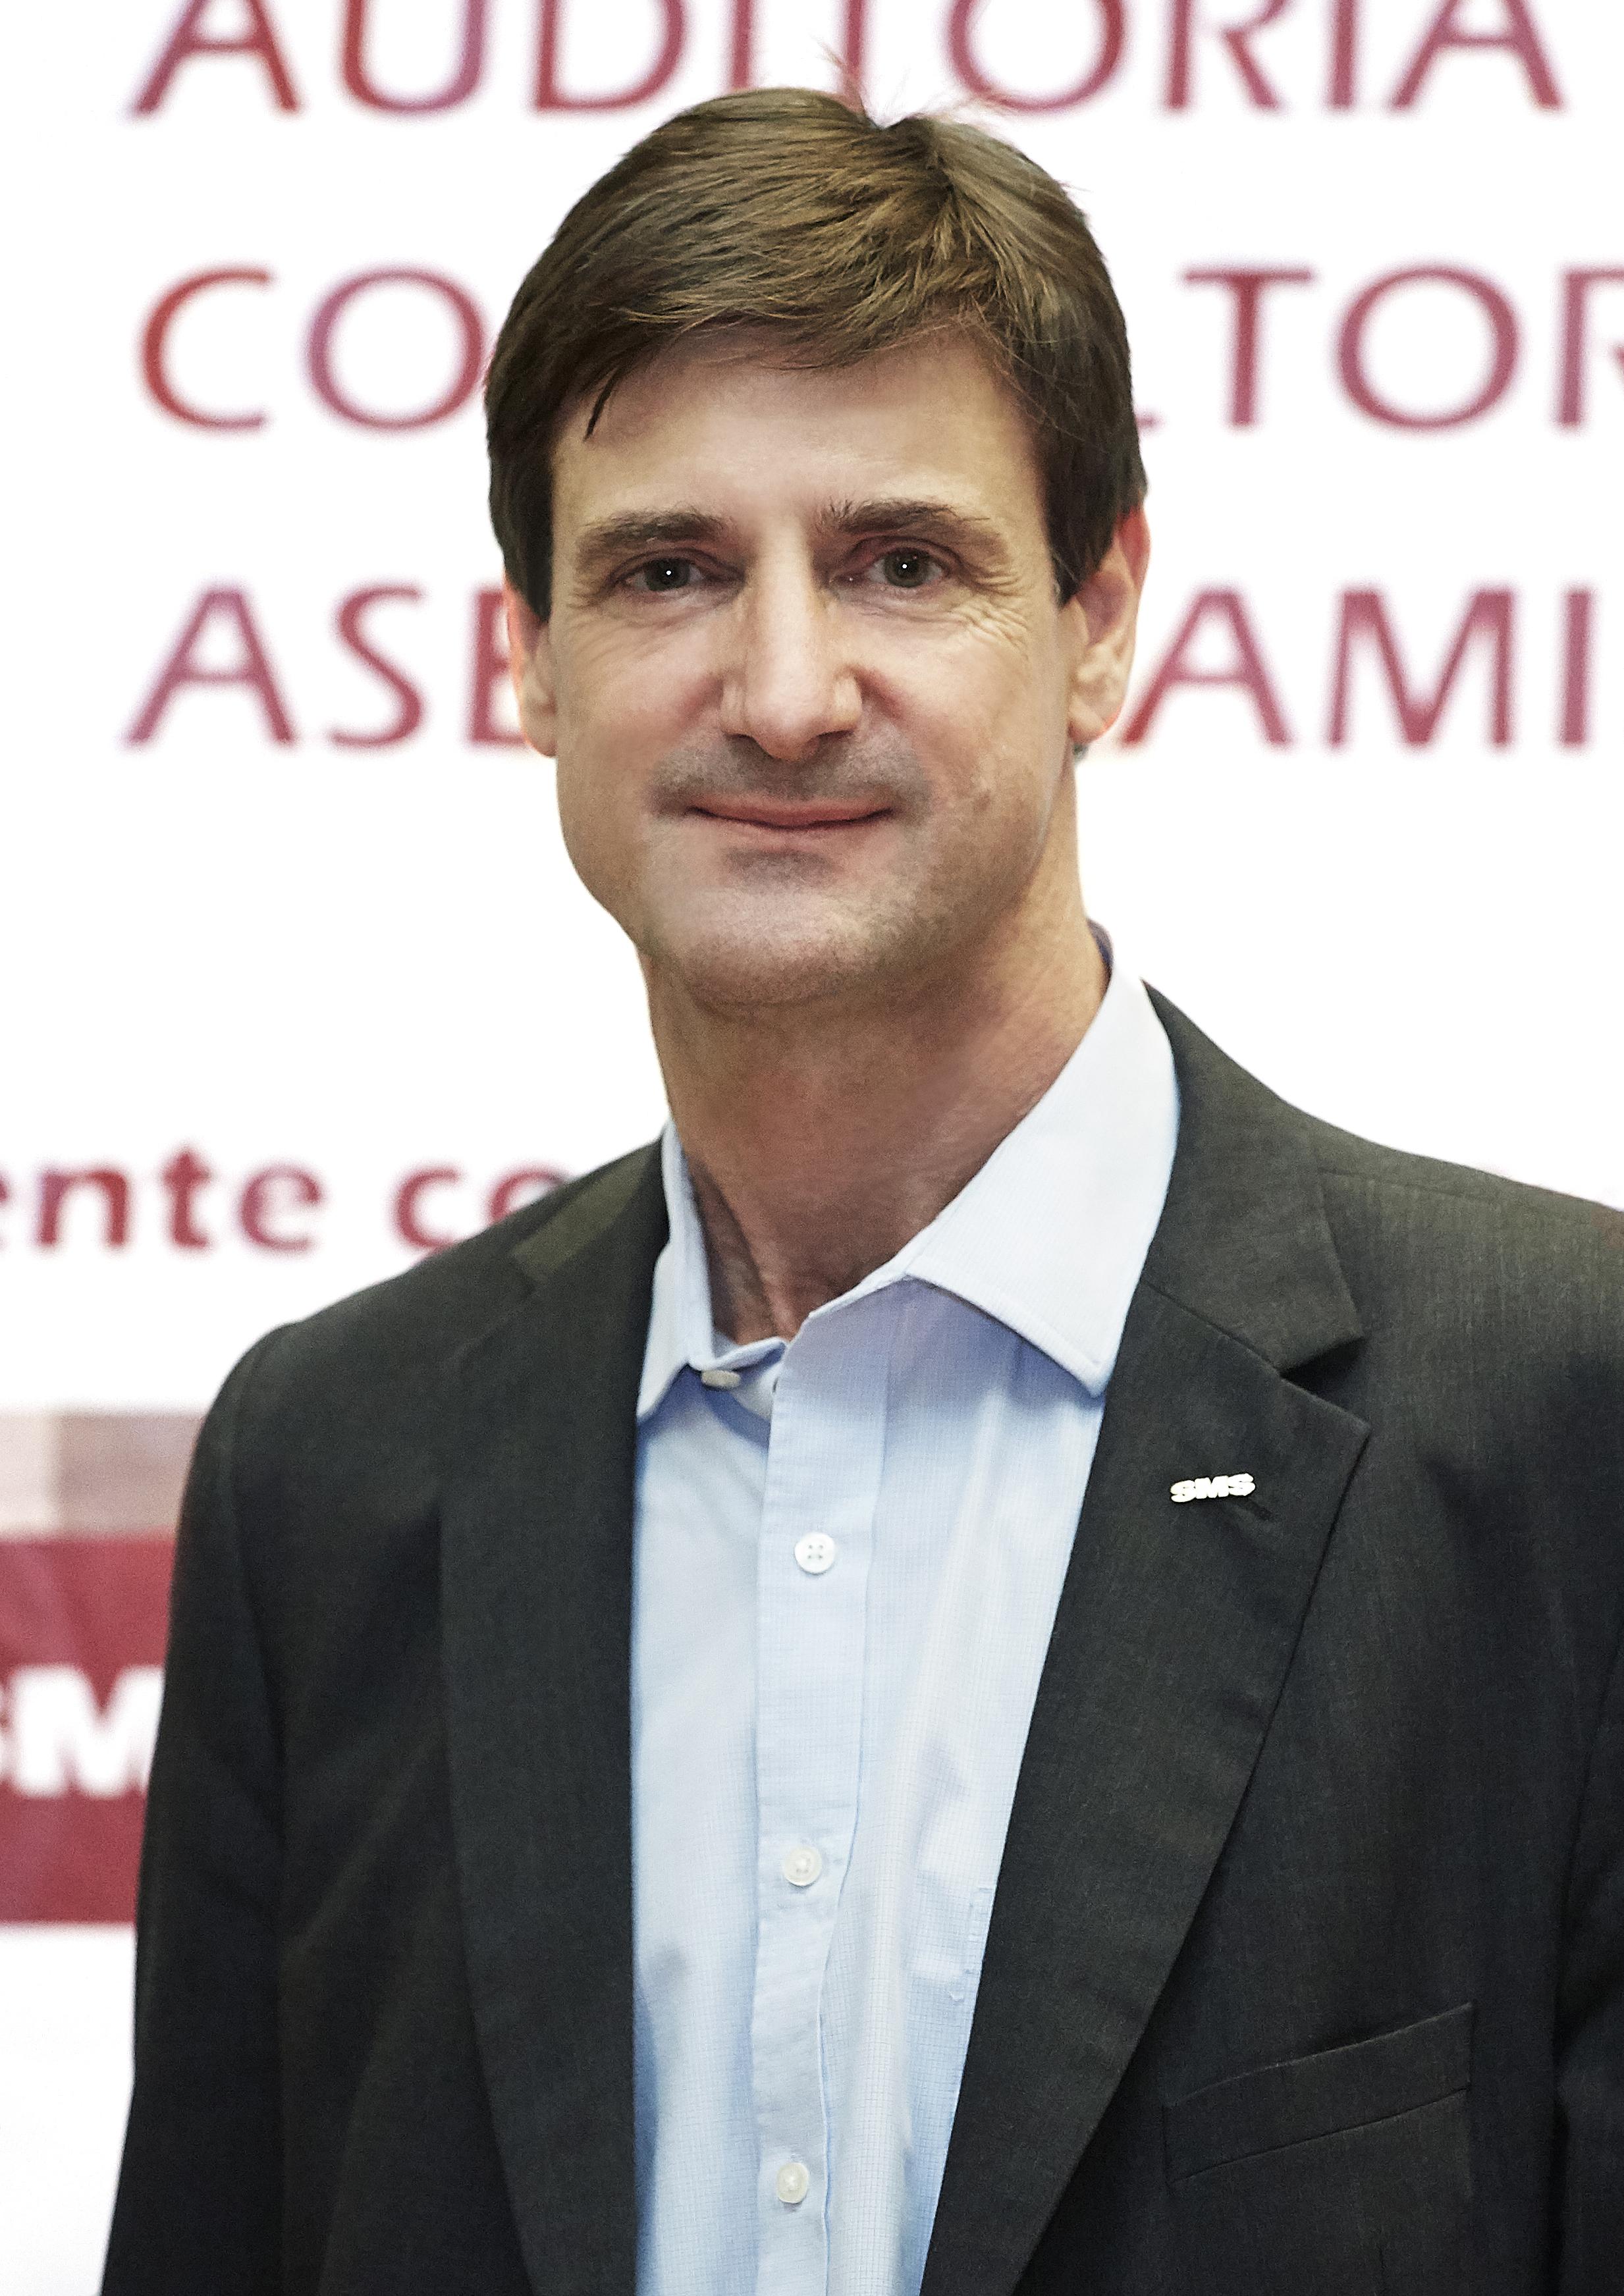 Pablo San Martin